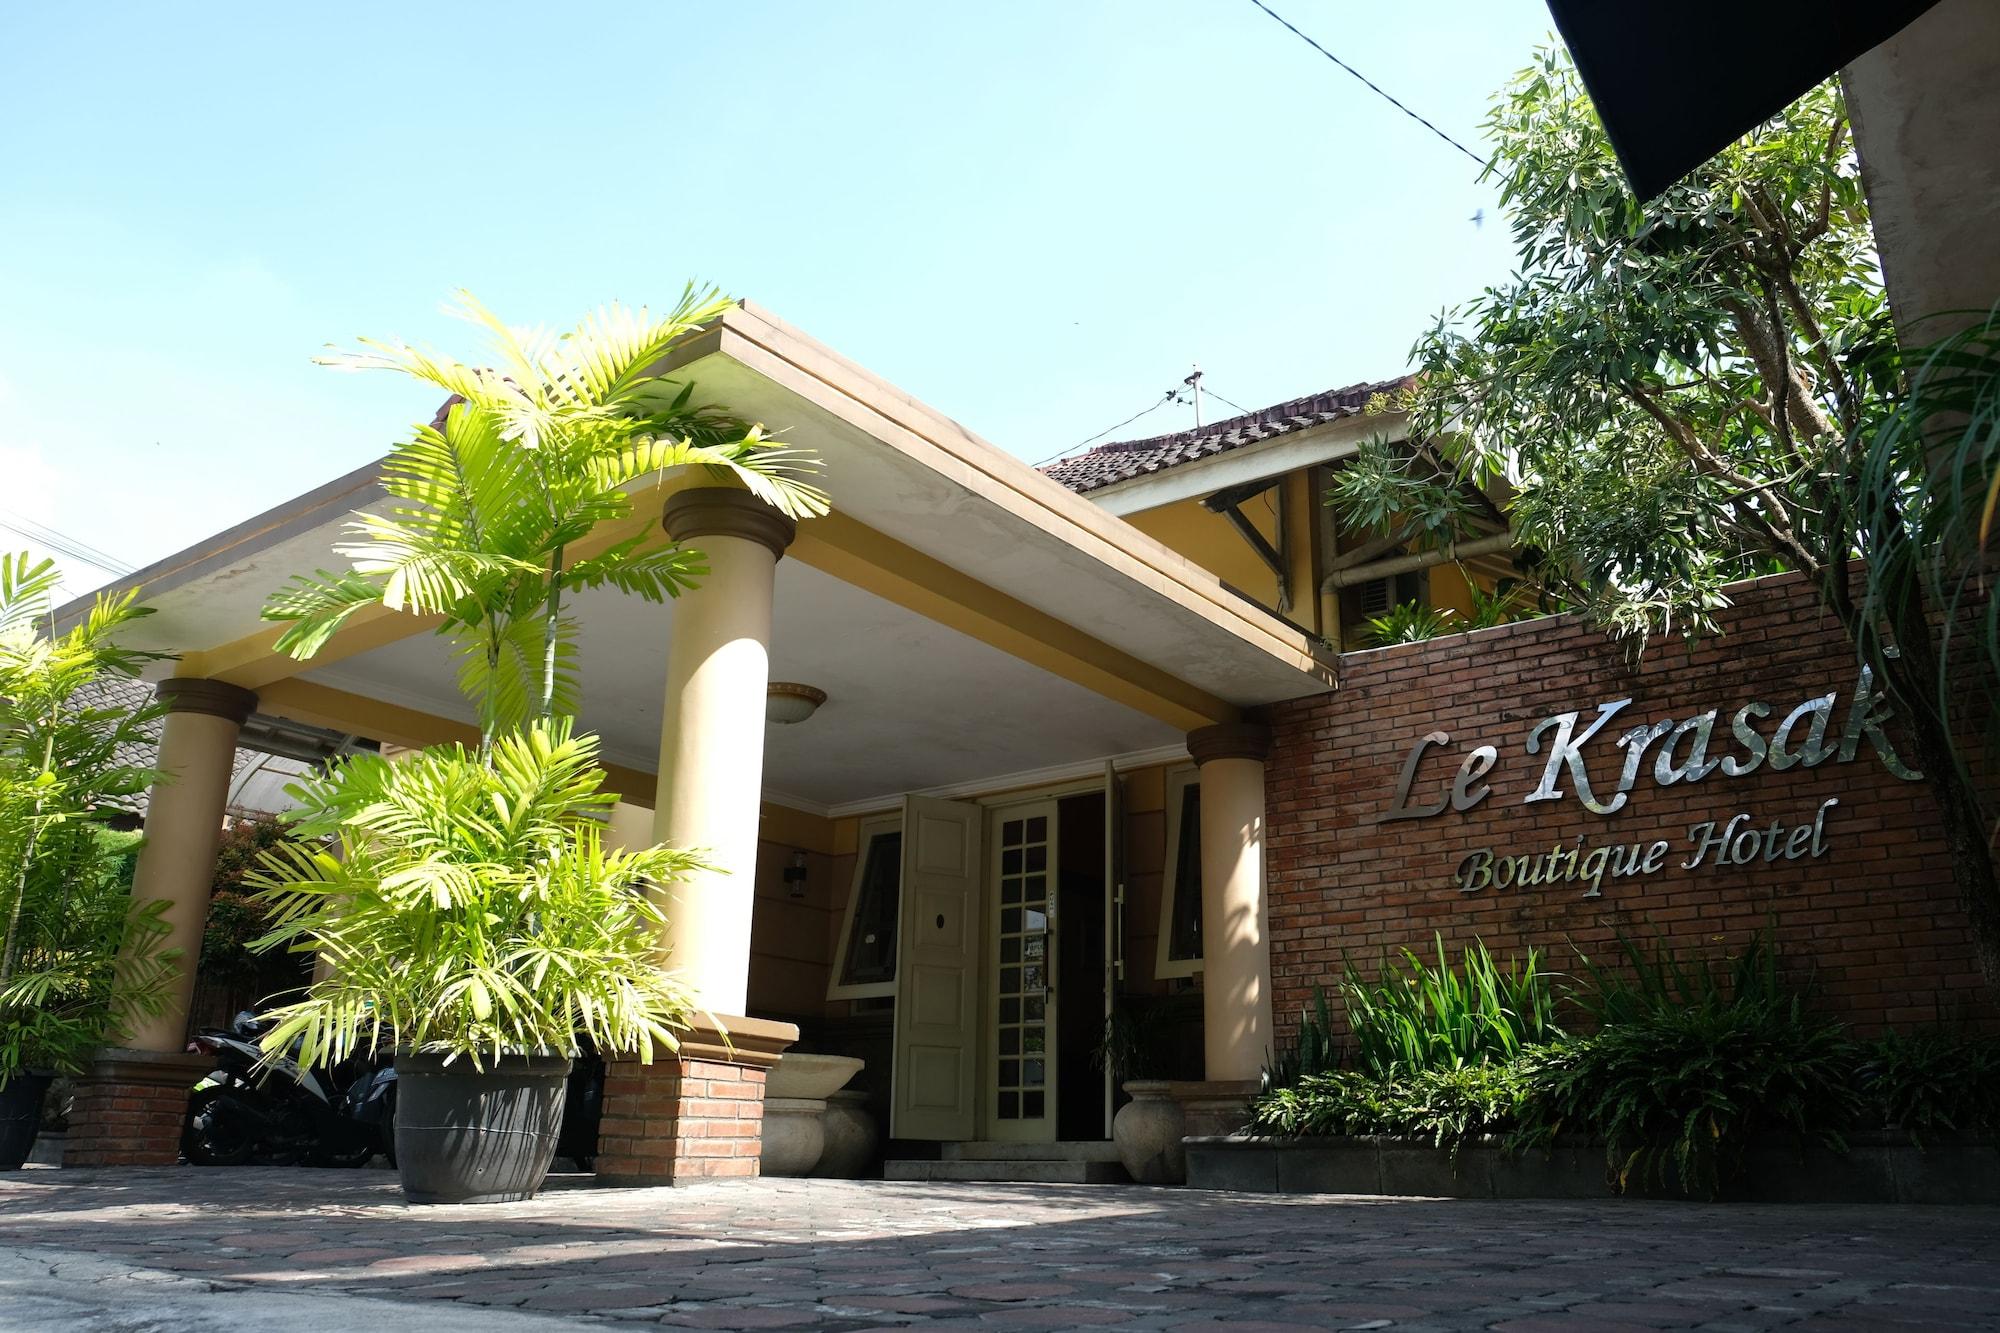 Le Krasak Boutique Hotel, Yogyakarta